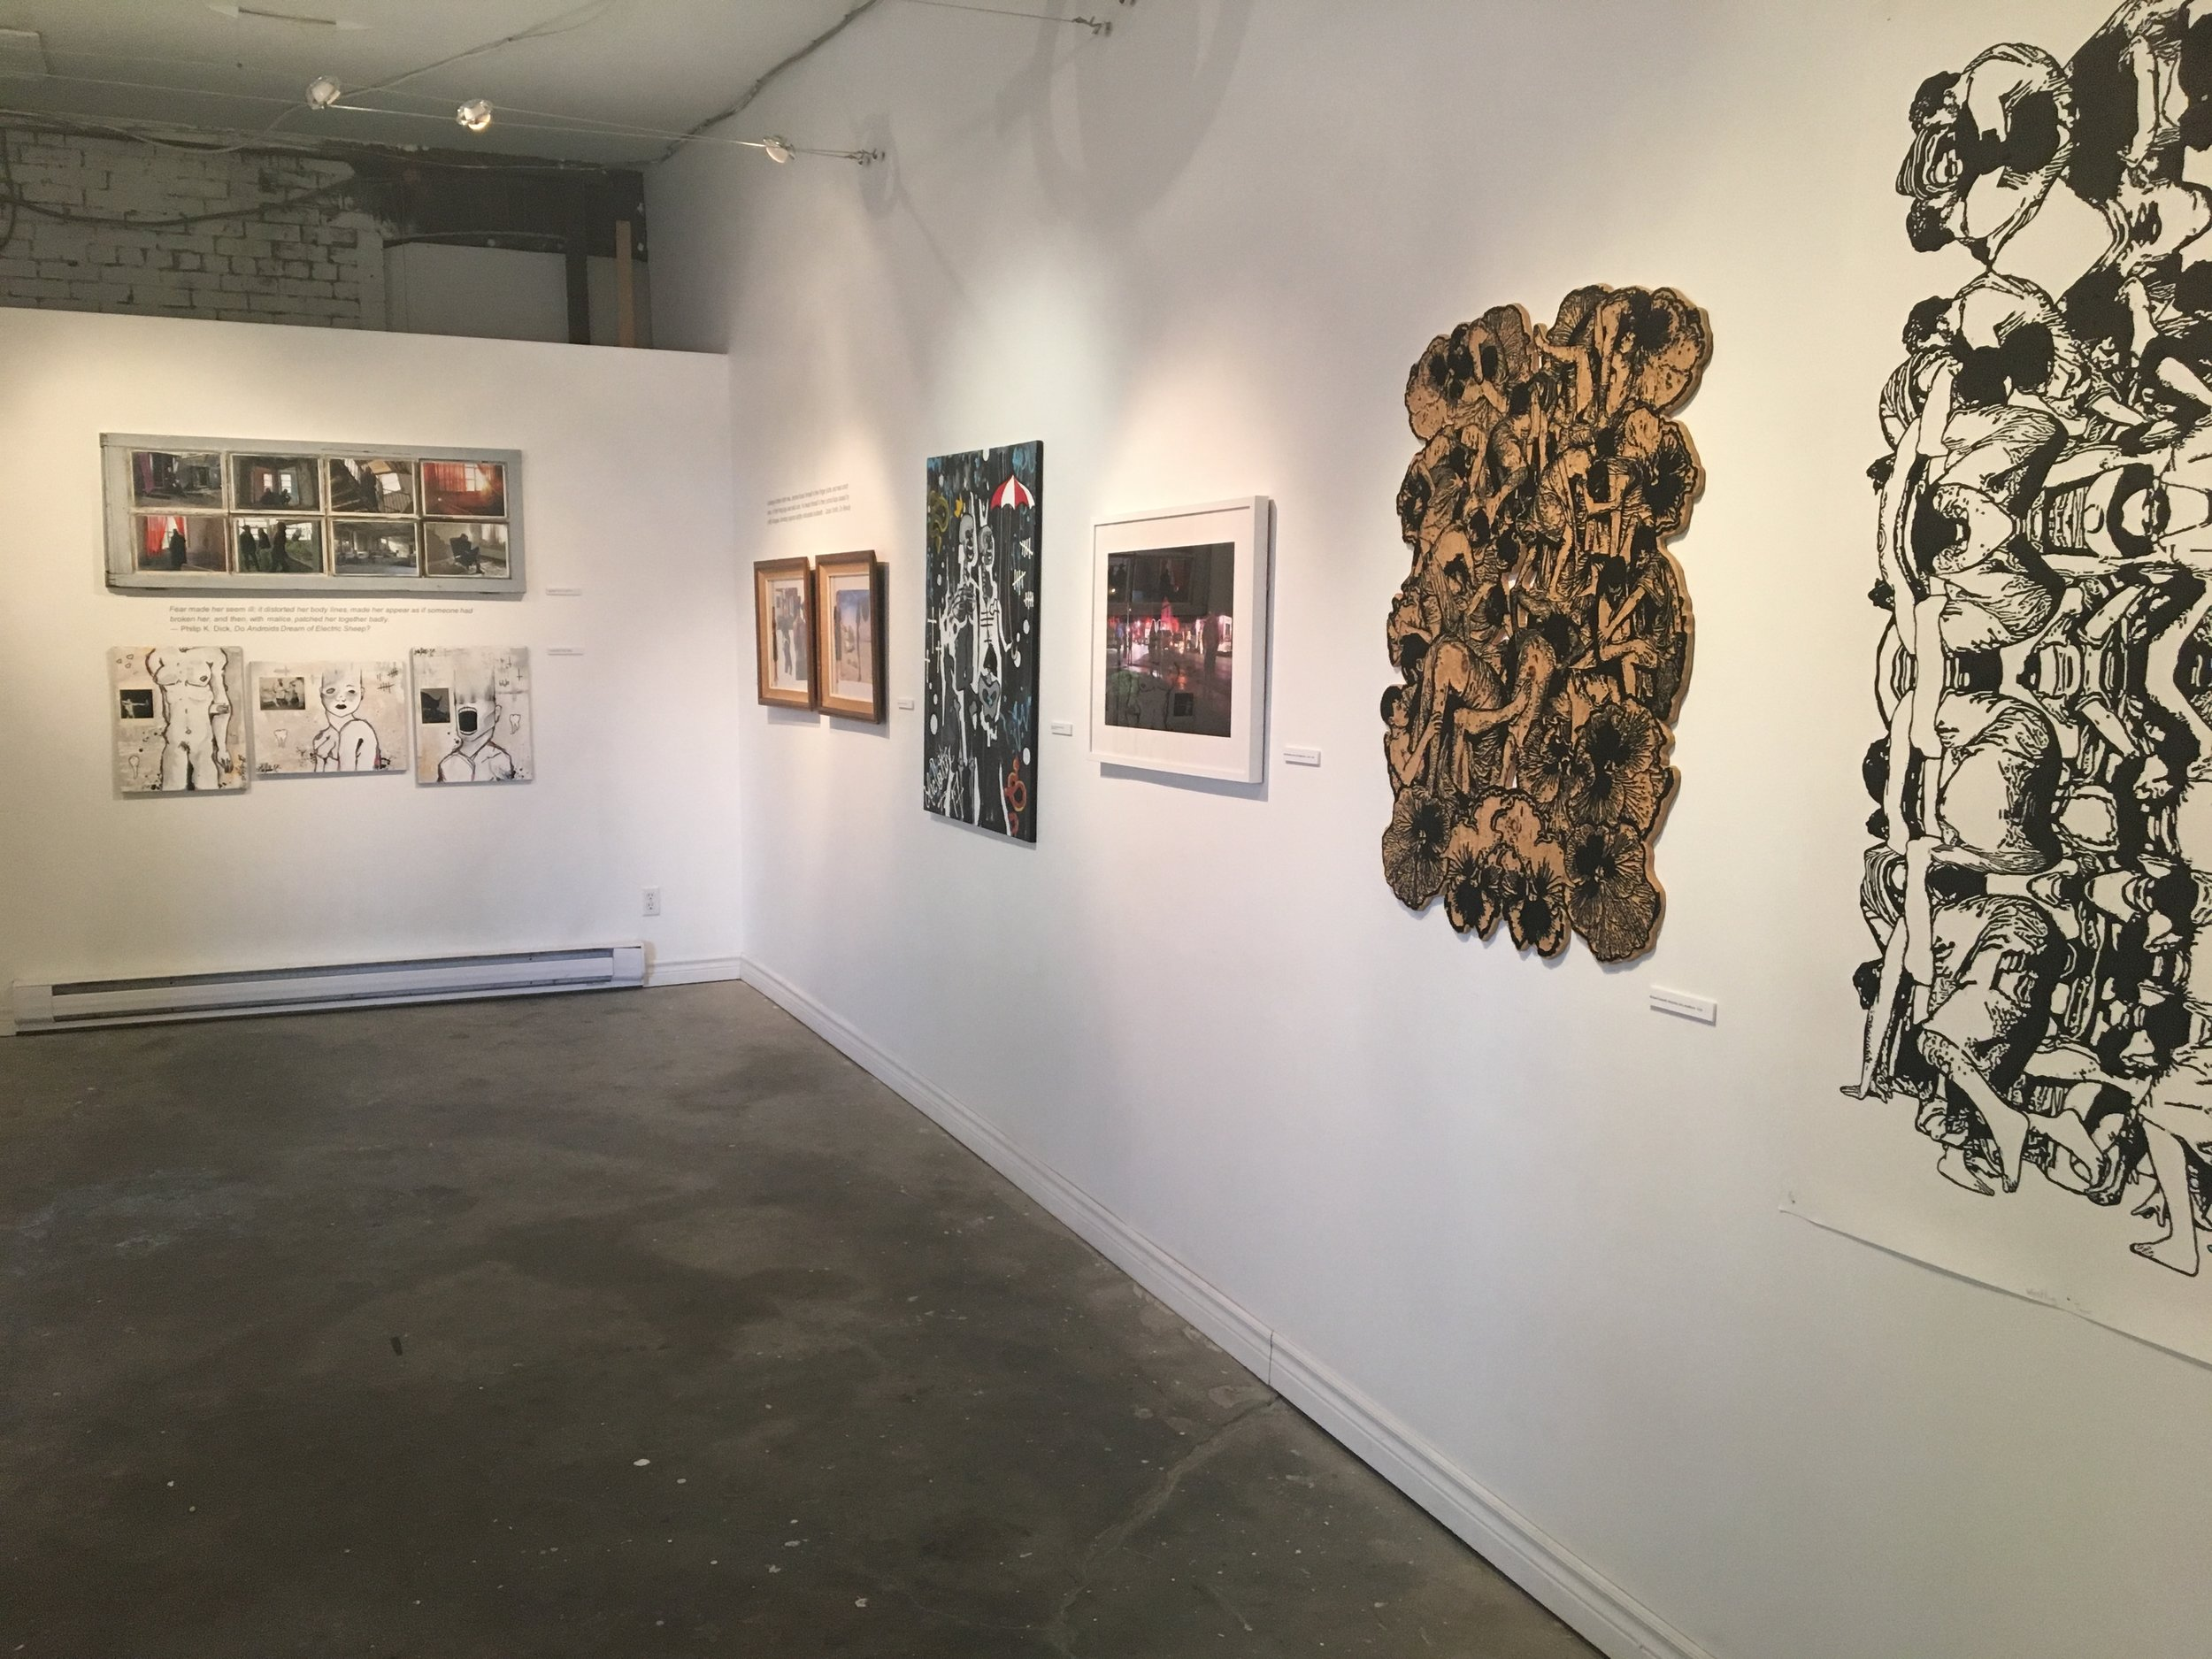 People Watching Exhibition - Dec 2018